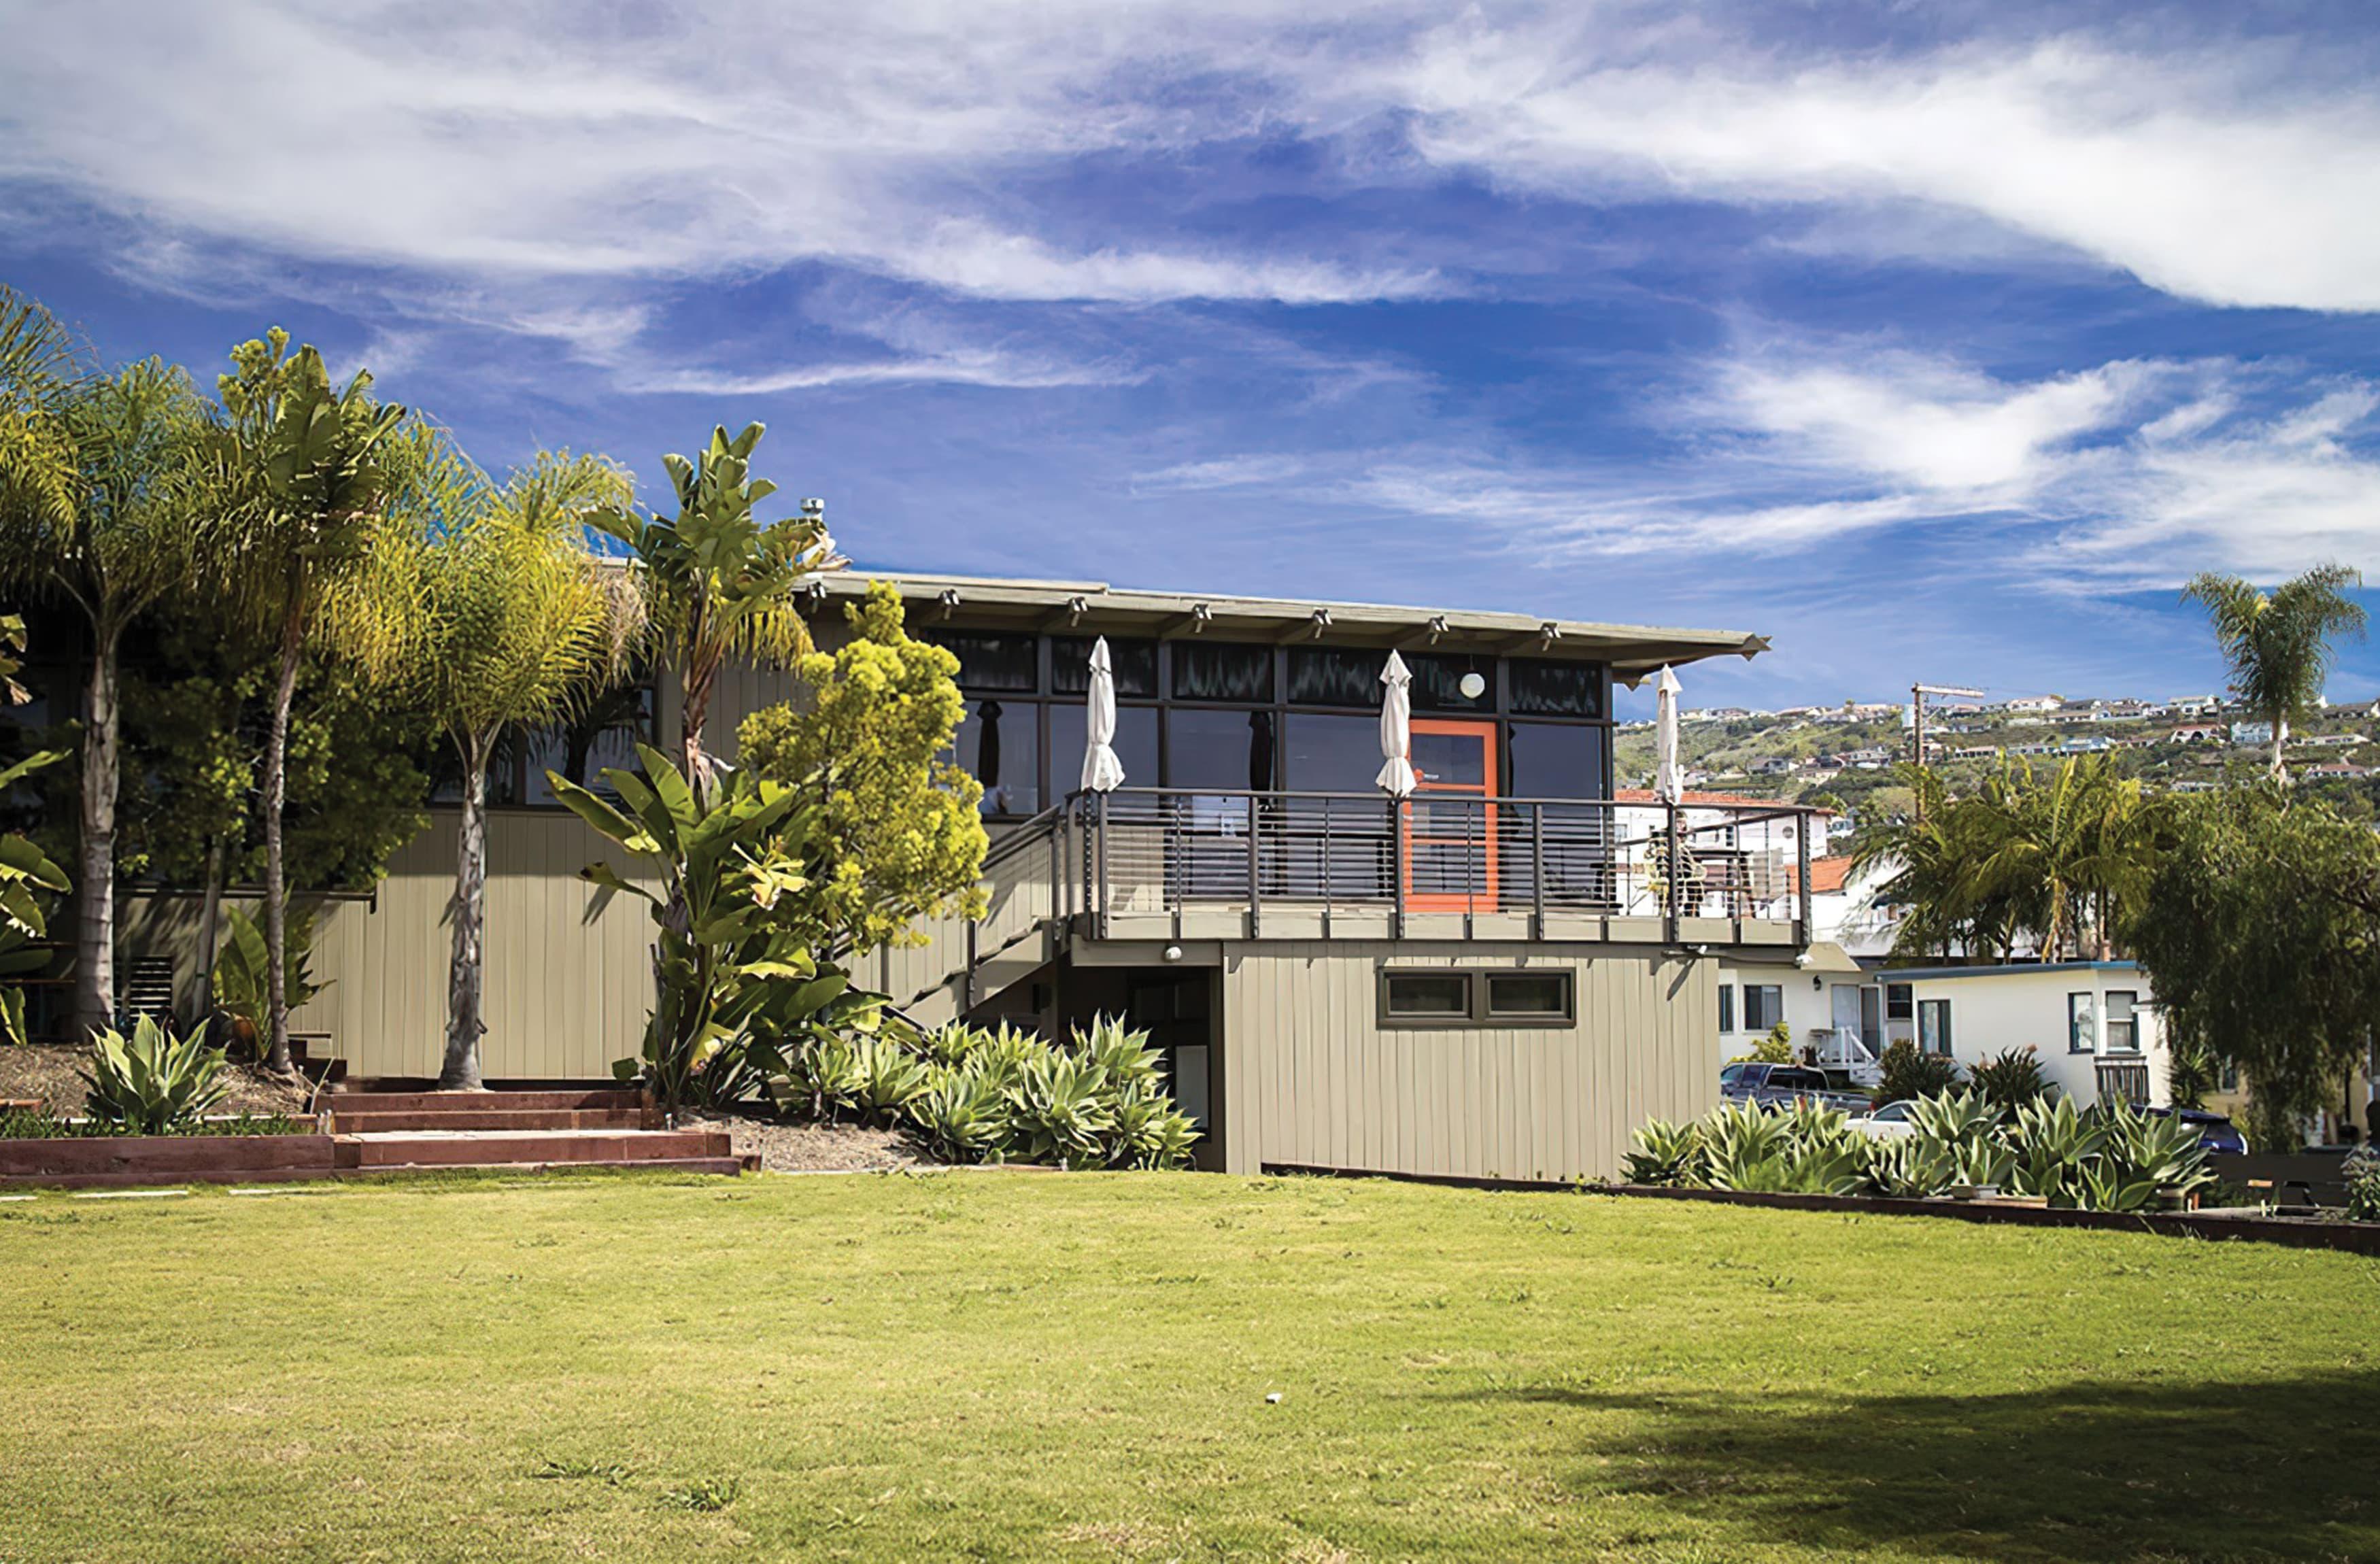 A photograph of RSM Design's San Clemente, California office.